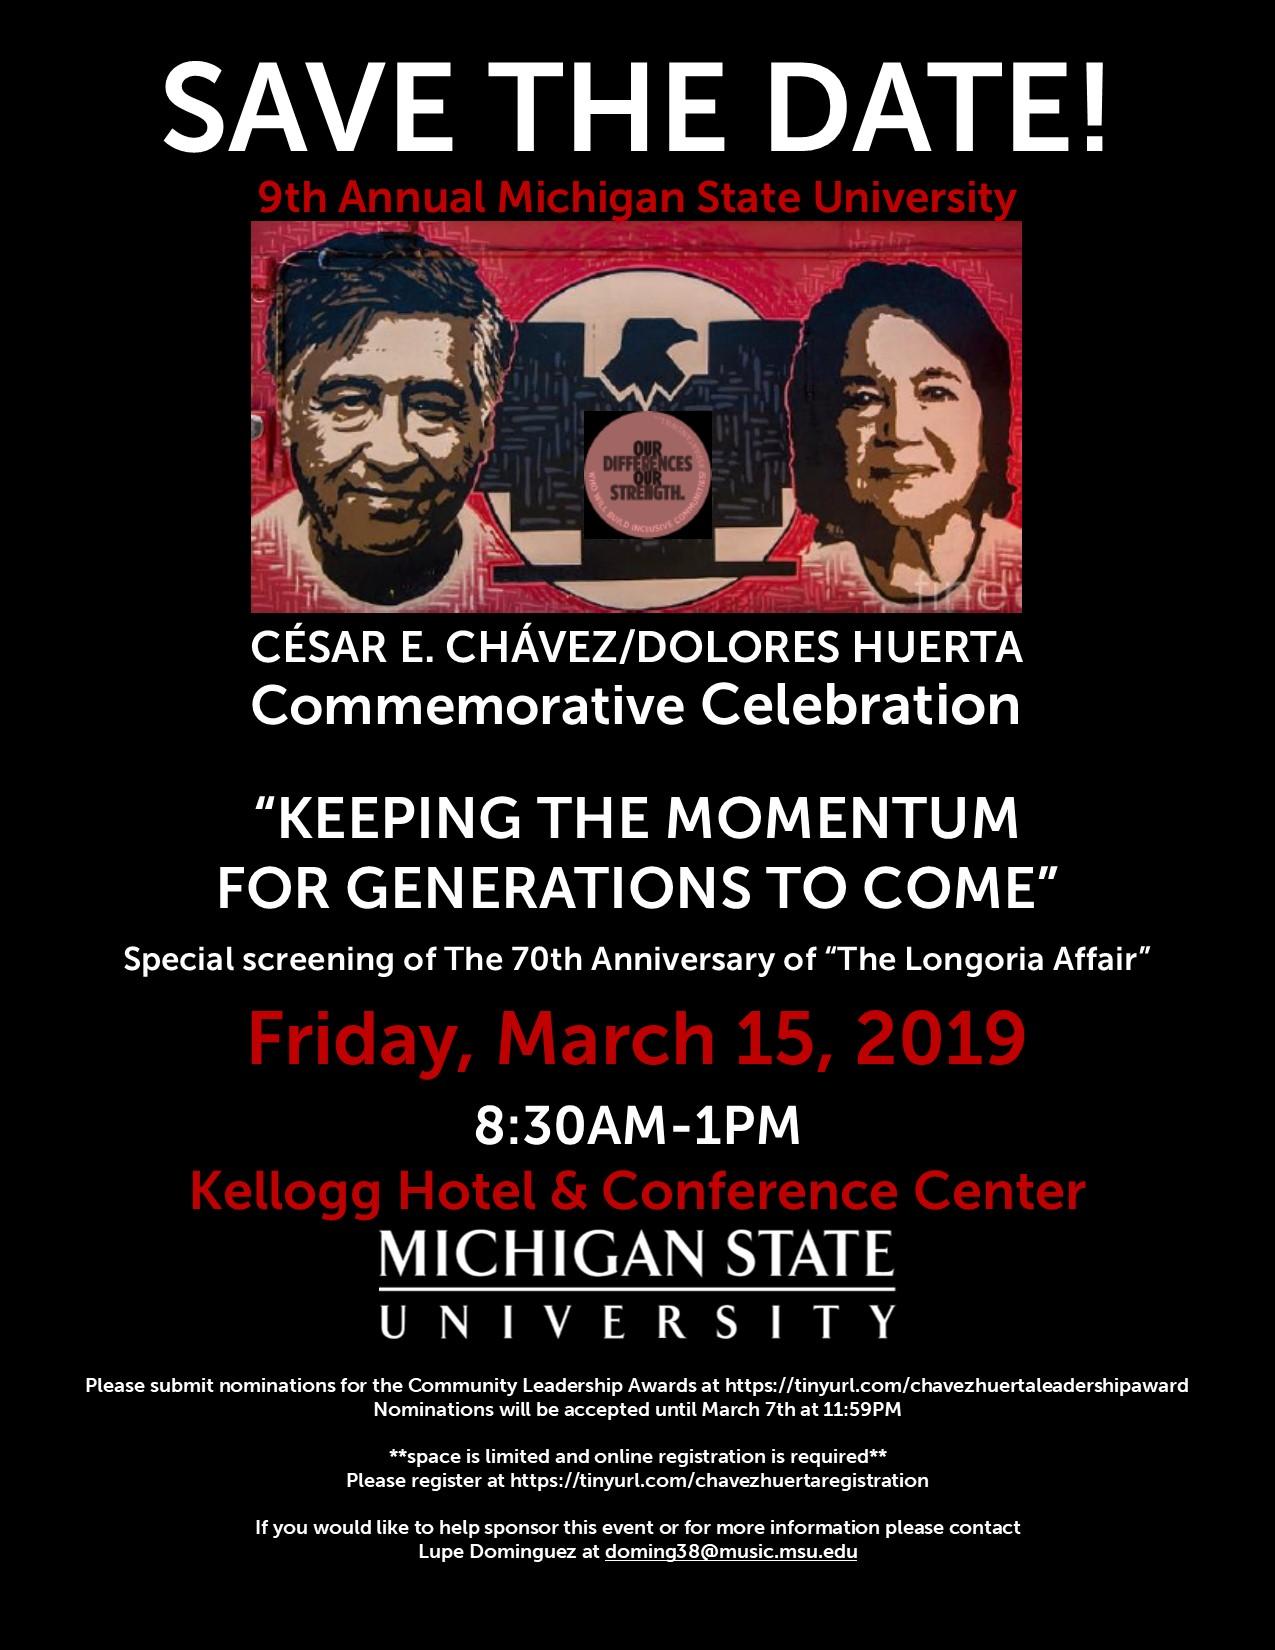 Cesar e Chavez/ Dolores Huerta Commemorative Celebration @ Kellog Hotel and  Conference Center